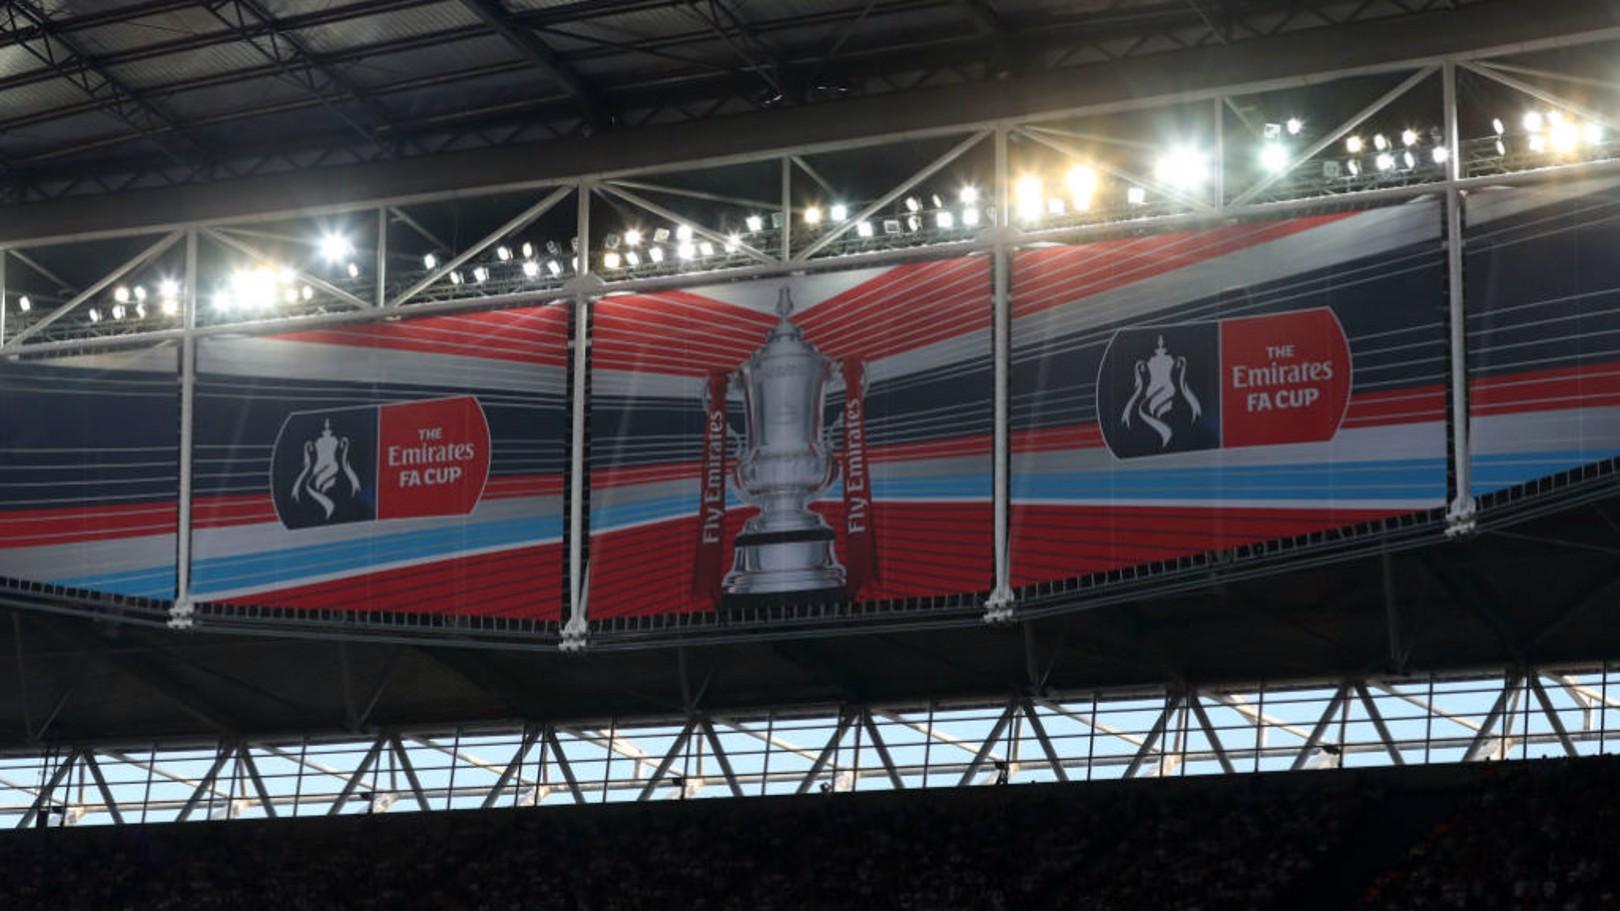 Kapan undian semifinal FA Cup?